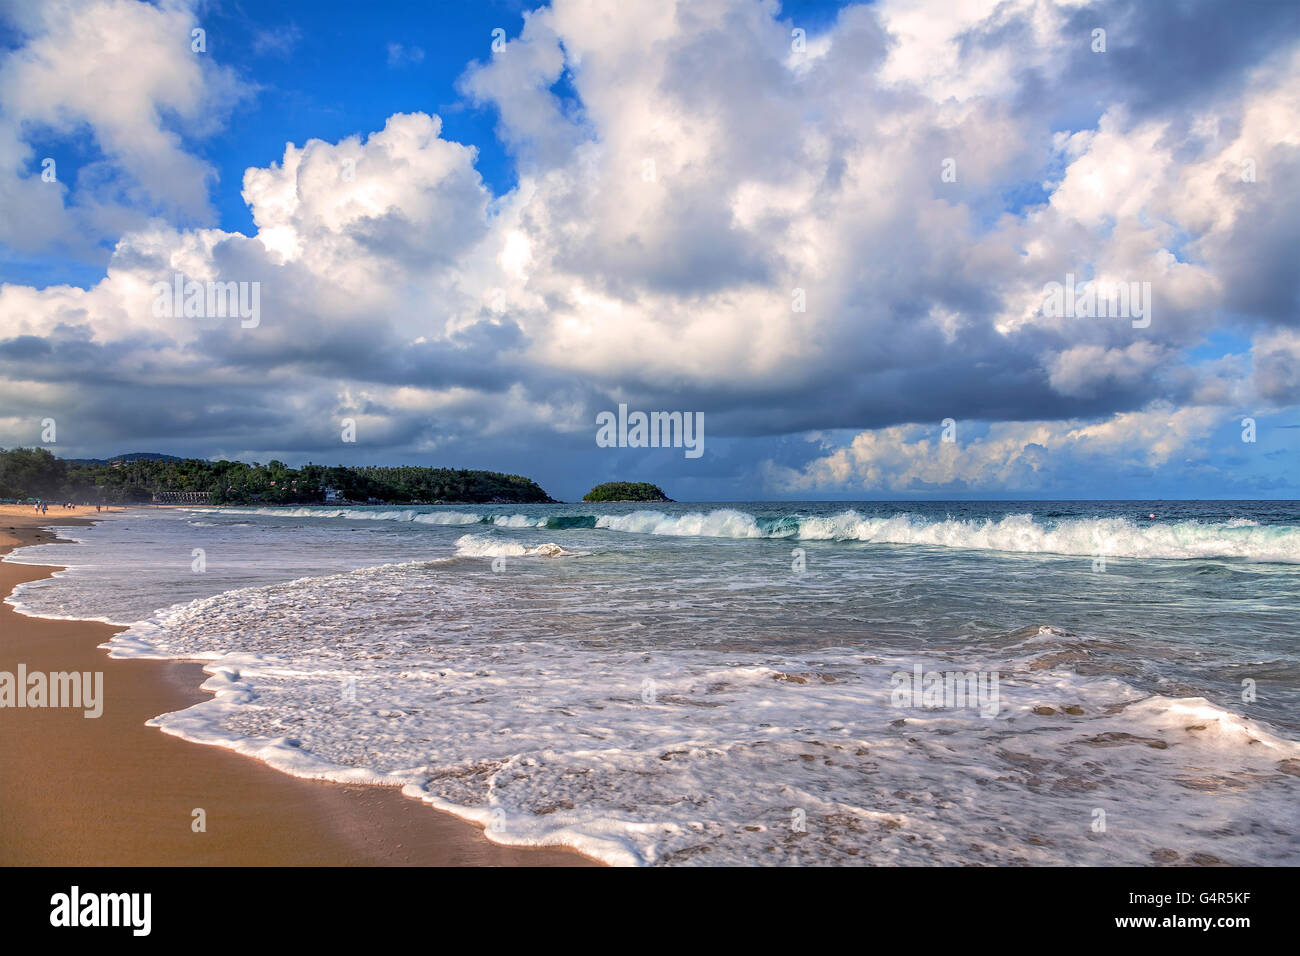 Sturm am Karon Beach. Insel Phuket in Thailand. Stockbild